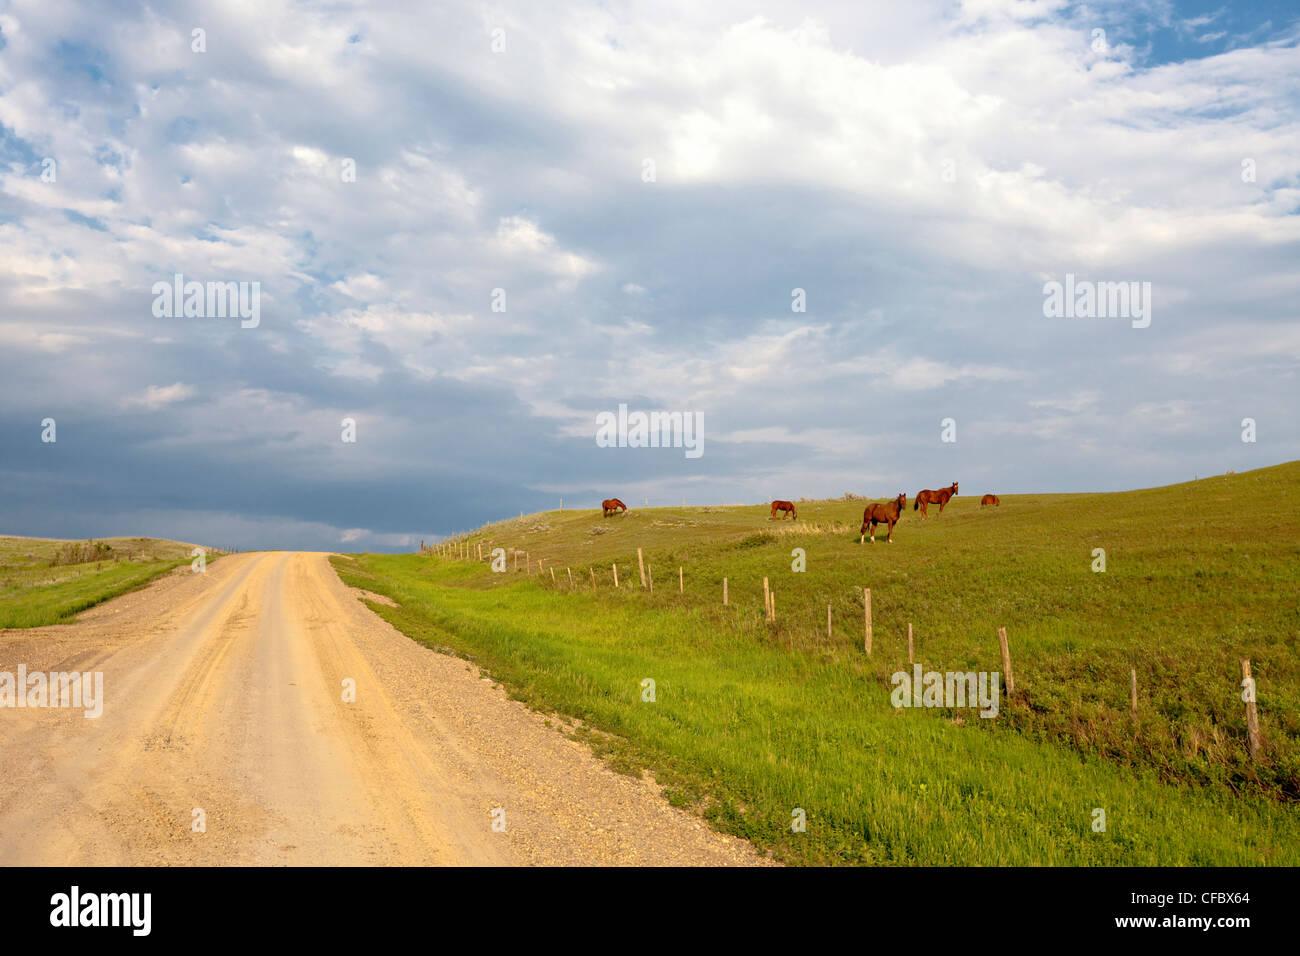 Clay road and horses grazing near Morse, Saskatchewan, Canada. - Stock Image